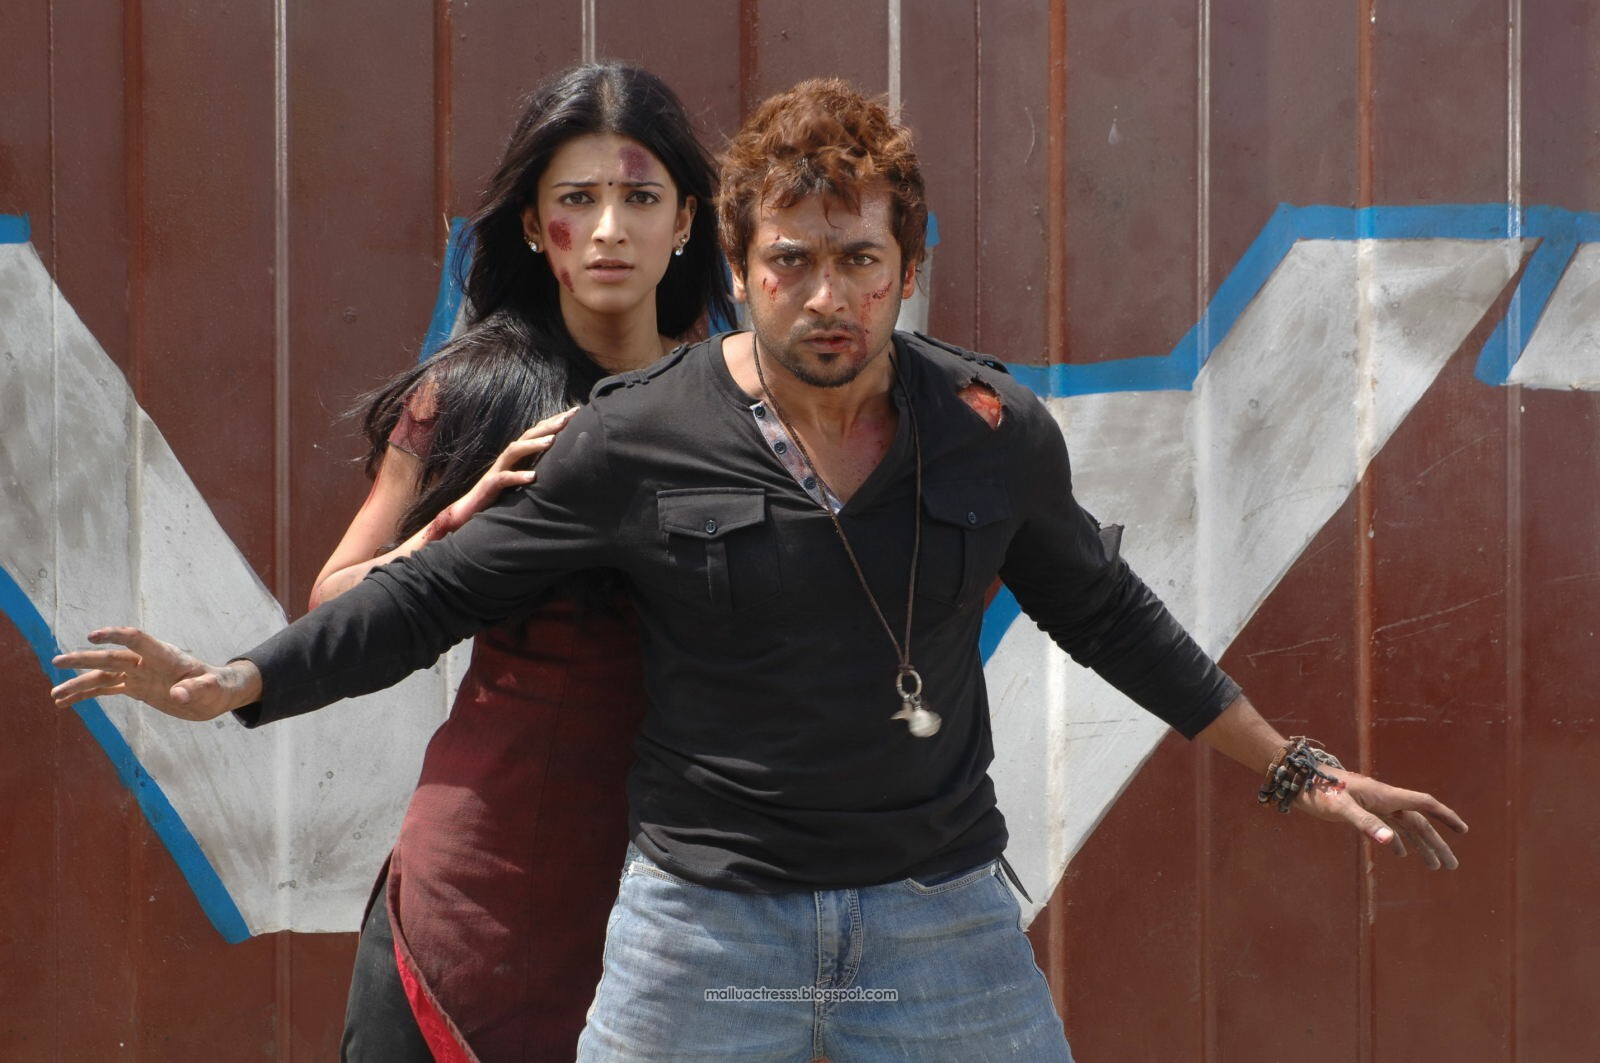 http://3.bp.blogspot.com/-oLEtVL167yQ/TpmO6wuMtqI/AAAAAAAAuhg/KIlENgX_Jmo/s1600/7am-Arivu-movie-gallery-8.jpg